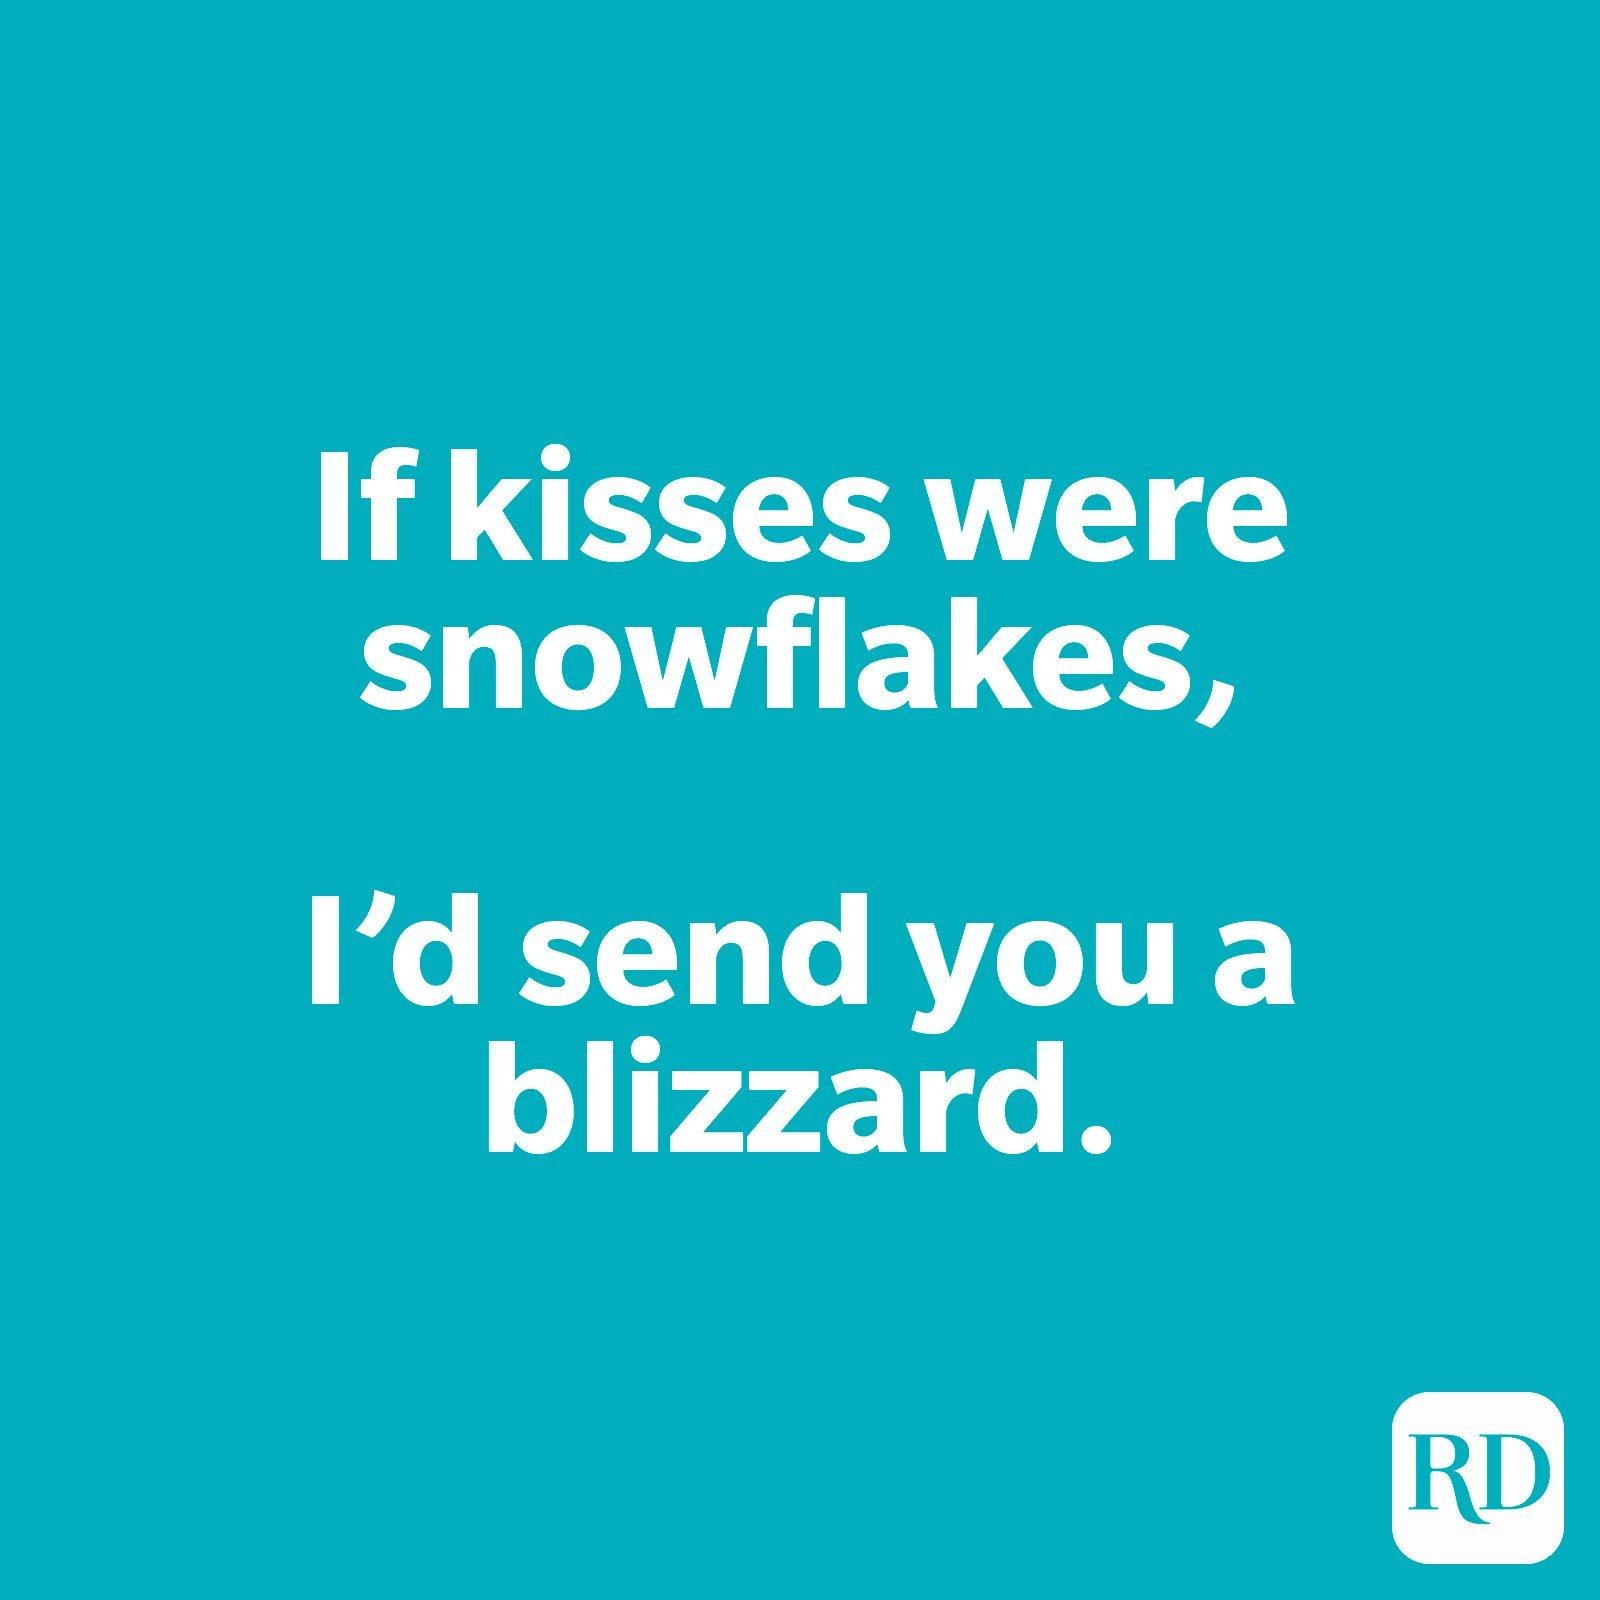 If kisses were snowflakes, I'd send you a blizzard.